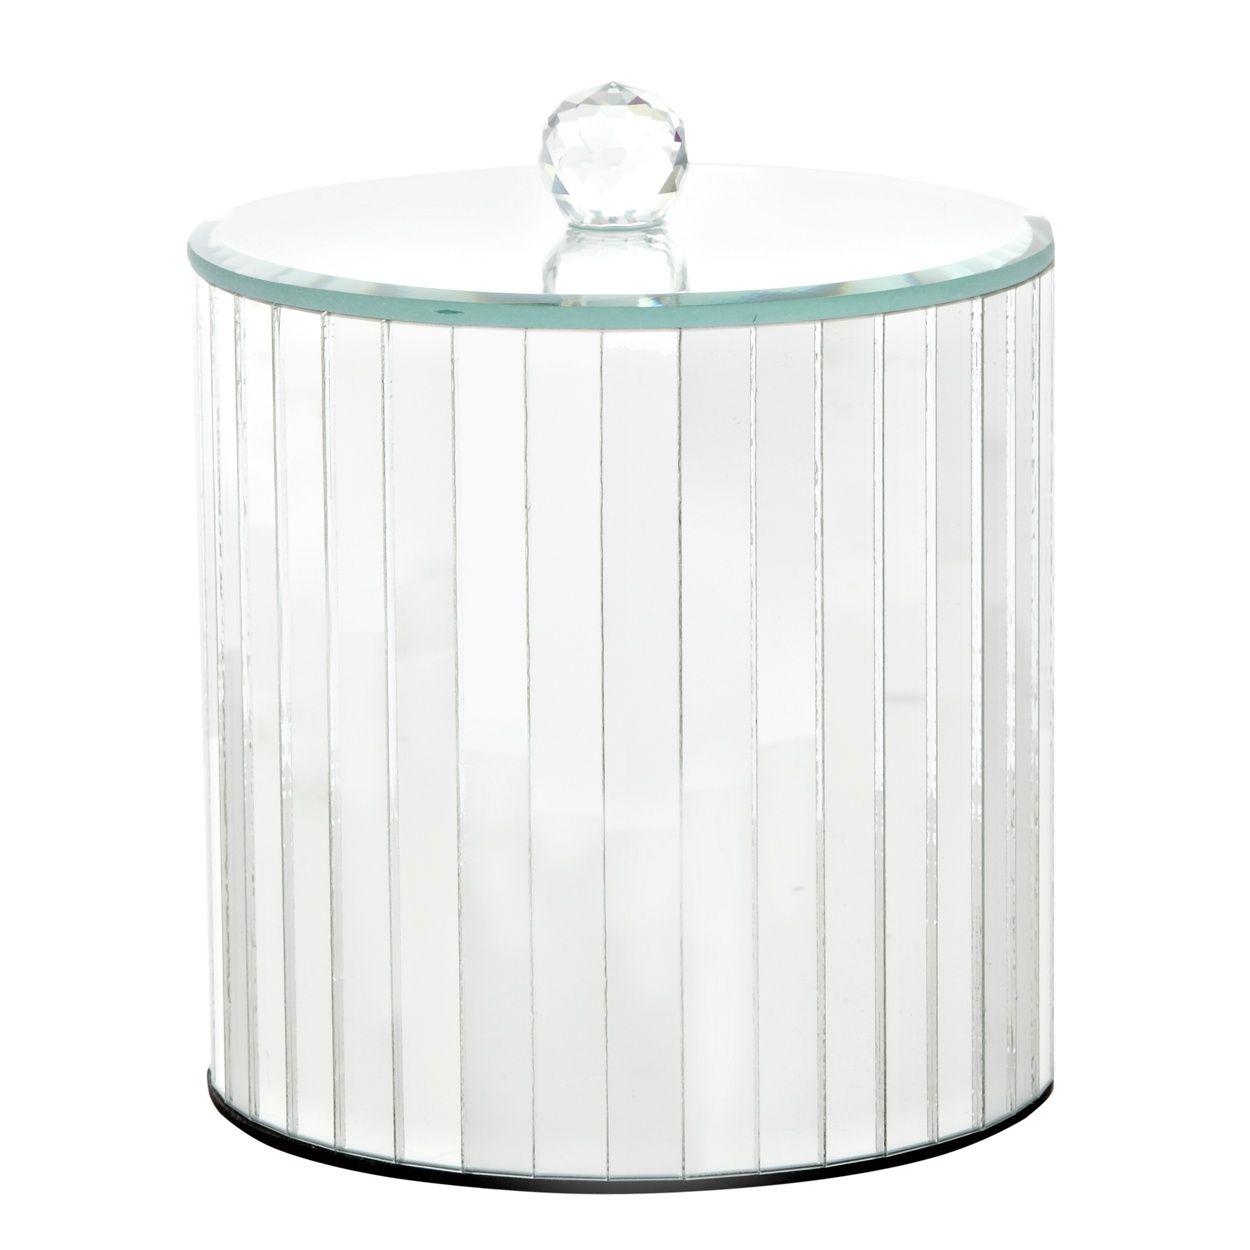 Star by Julien Macdonald Mirror large storage jar- at Debenhams.com ...